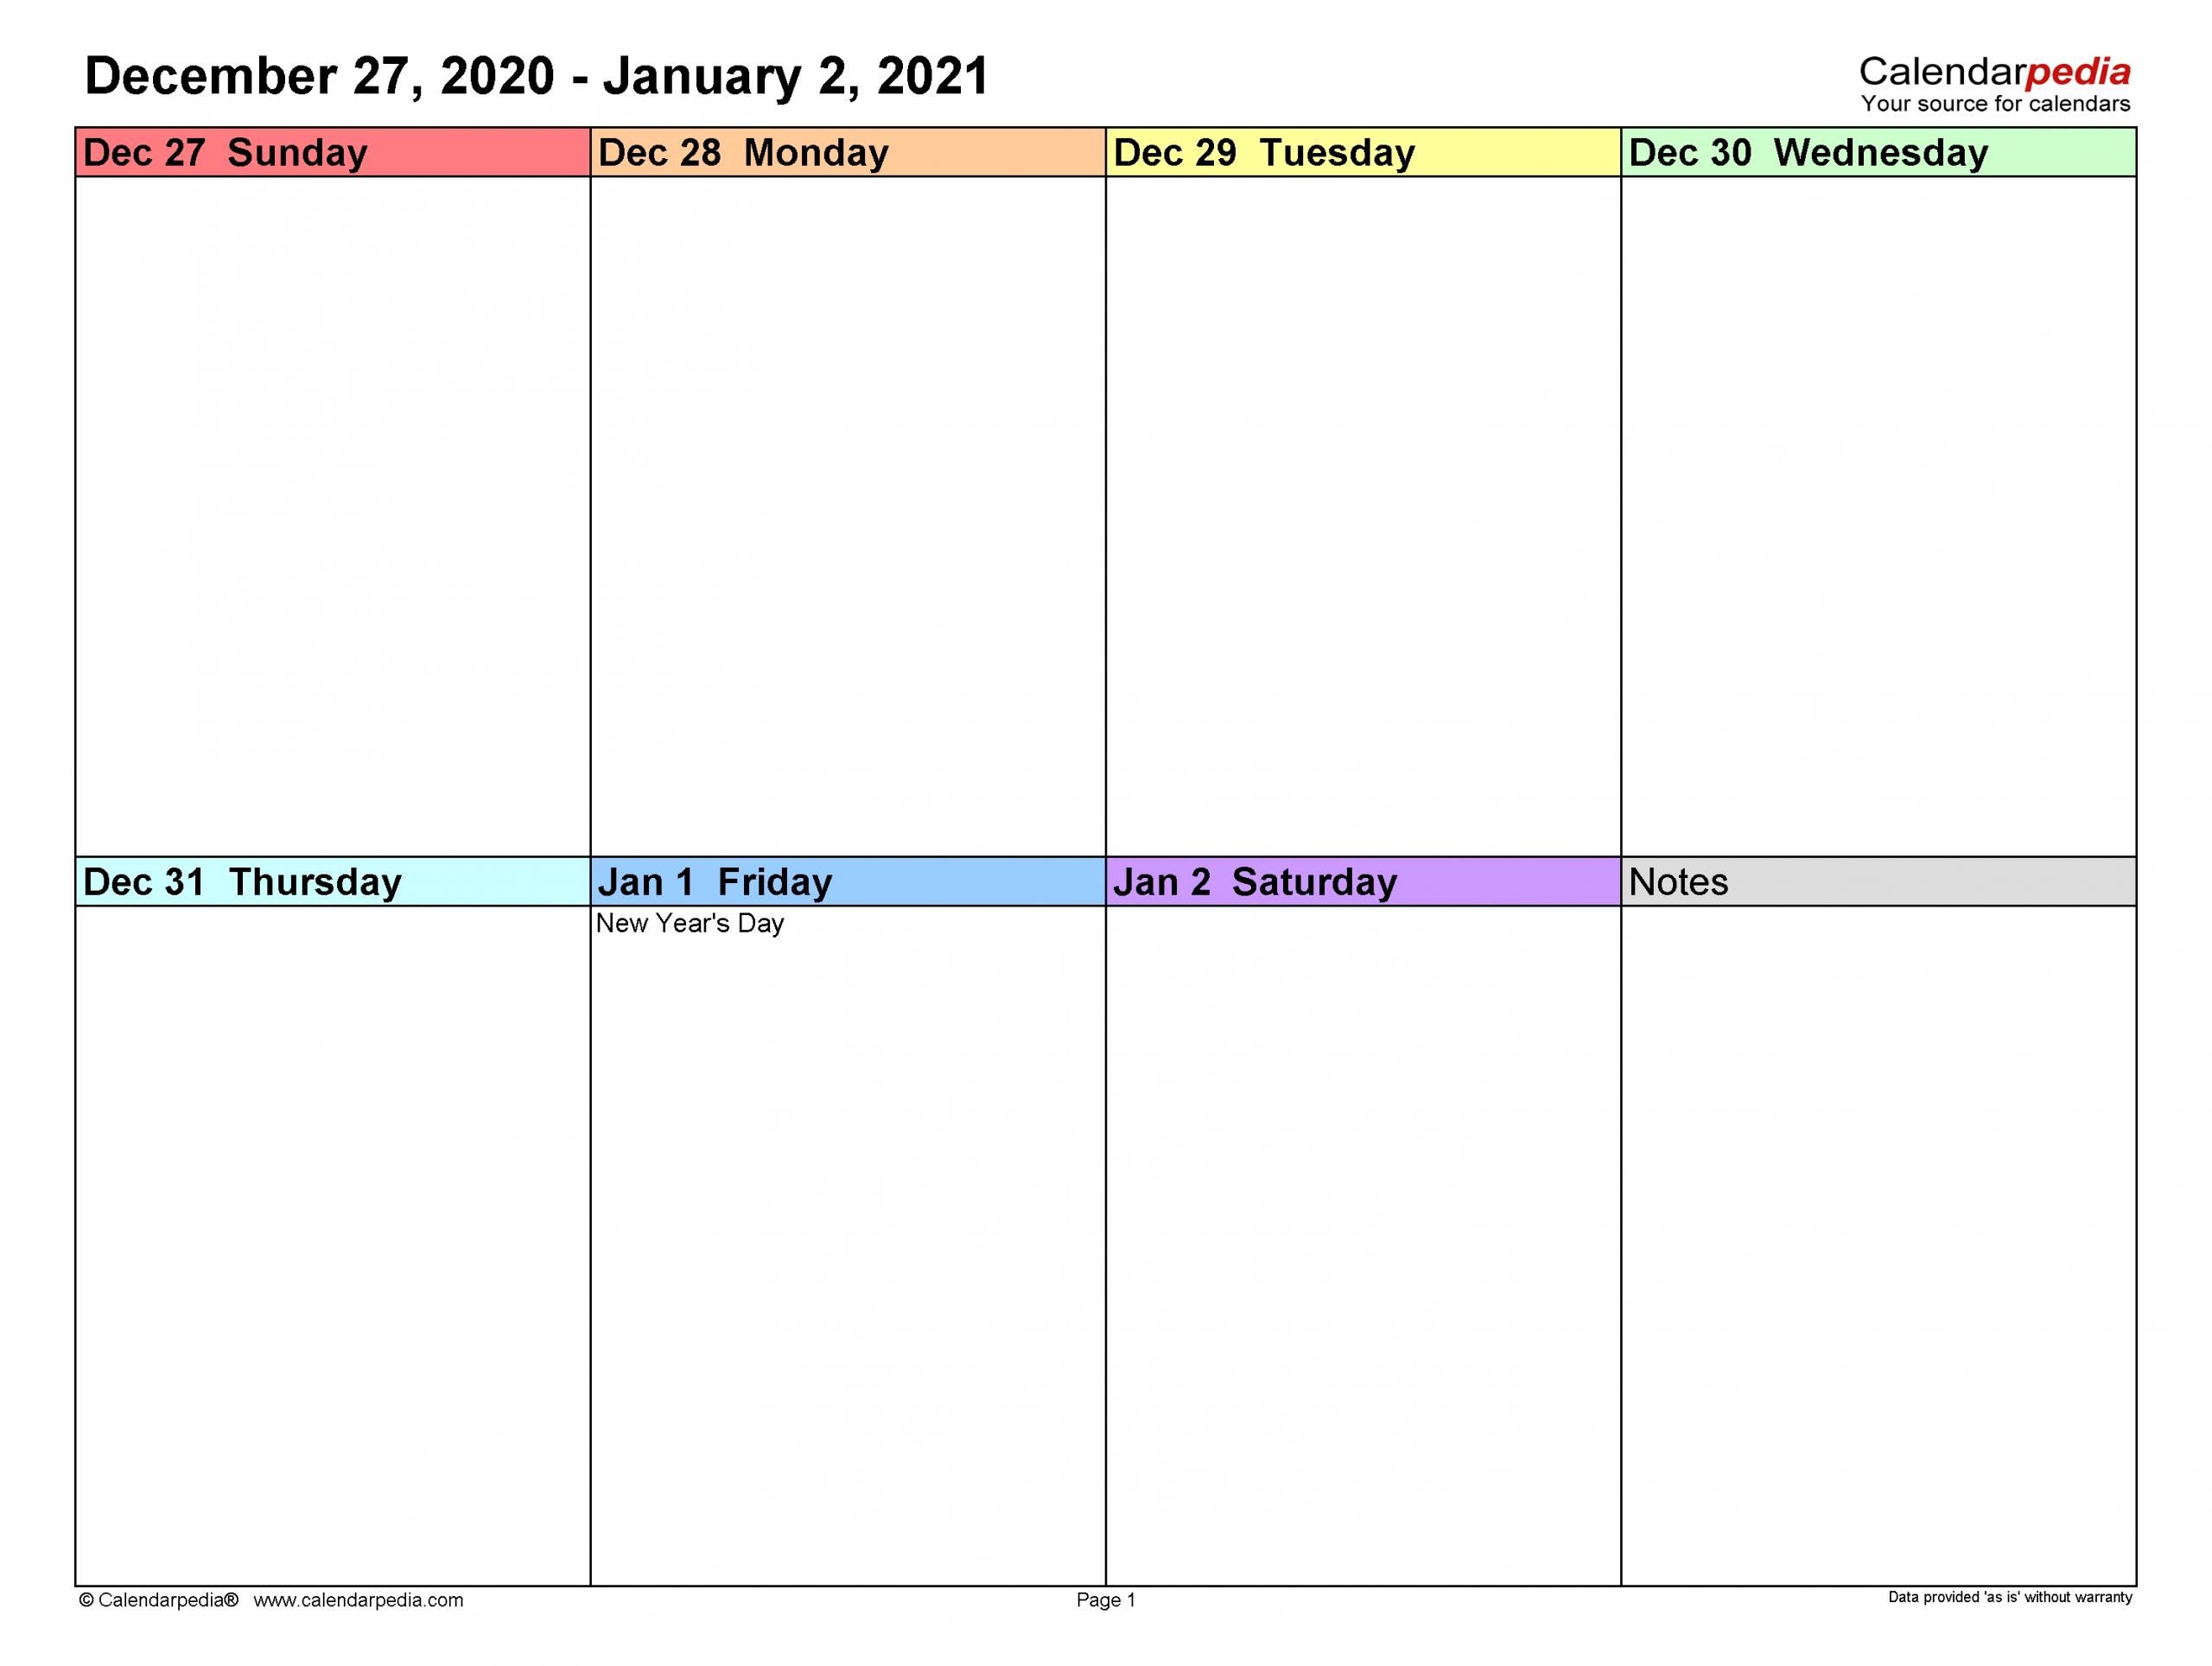 Weekly Calendars 2021 For Word - 12 Free Printable Templates  Printable Weekly Calendar Templates Free 2021